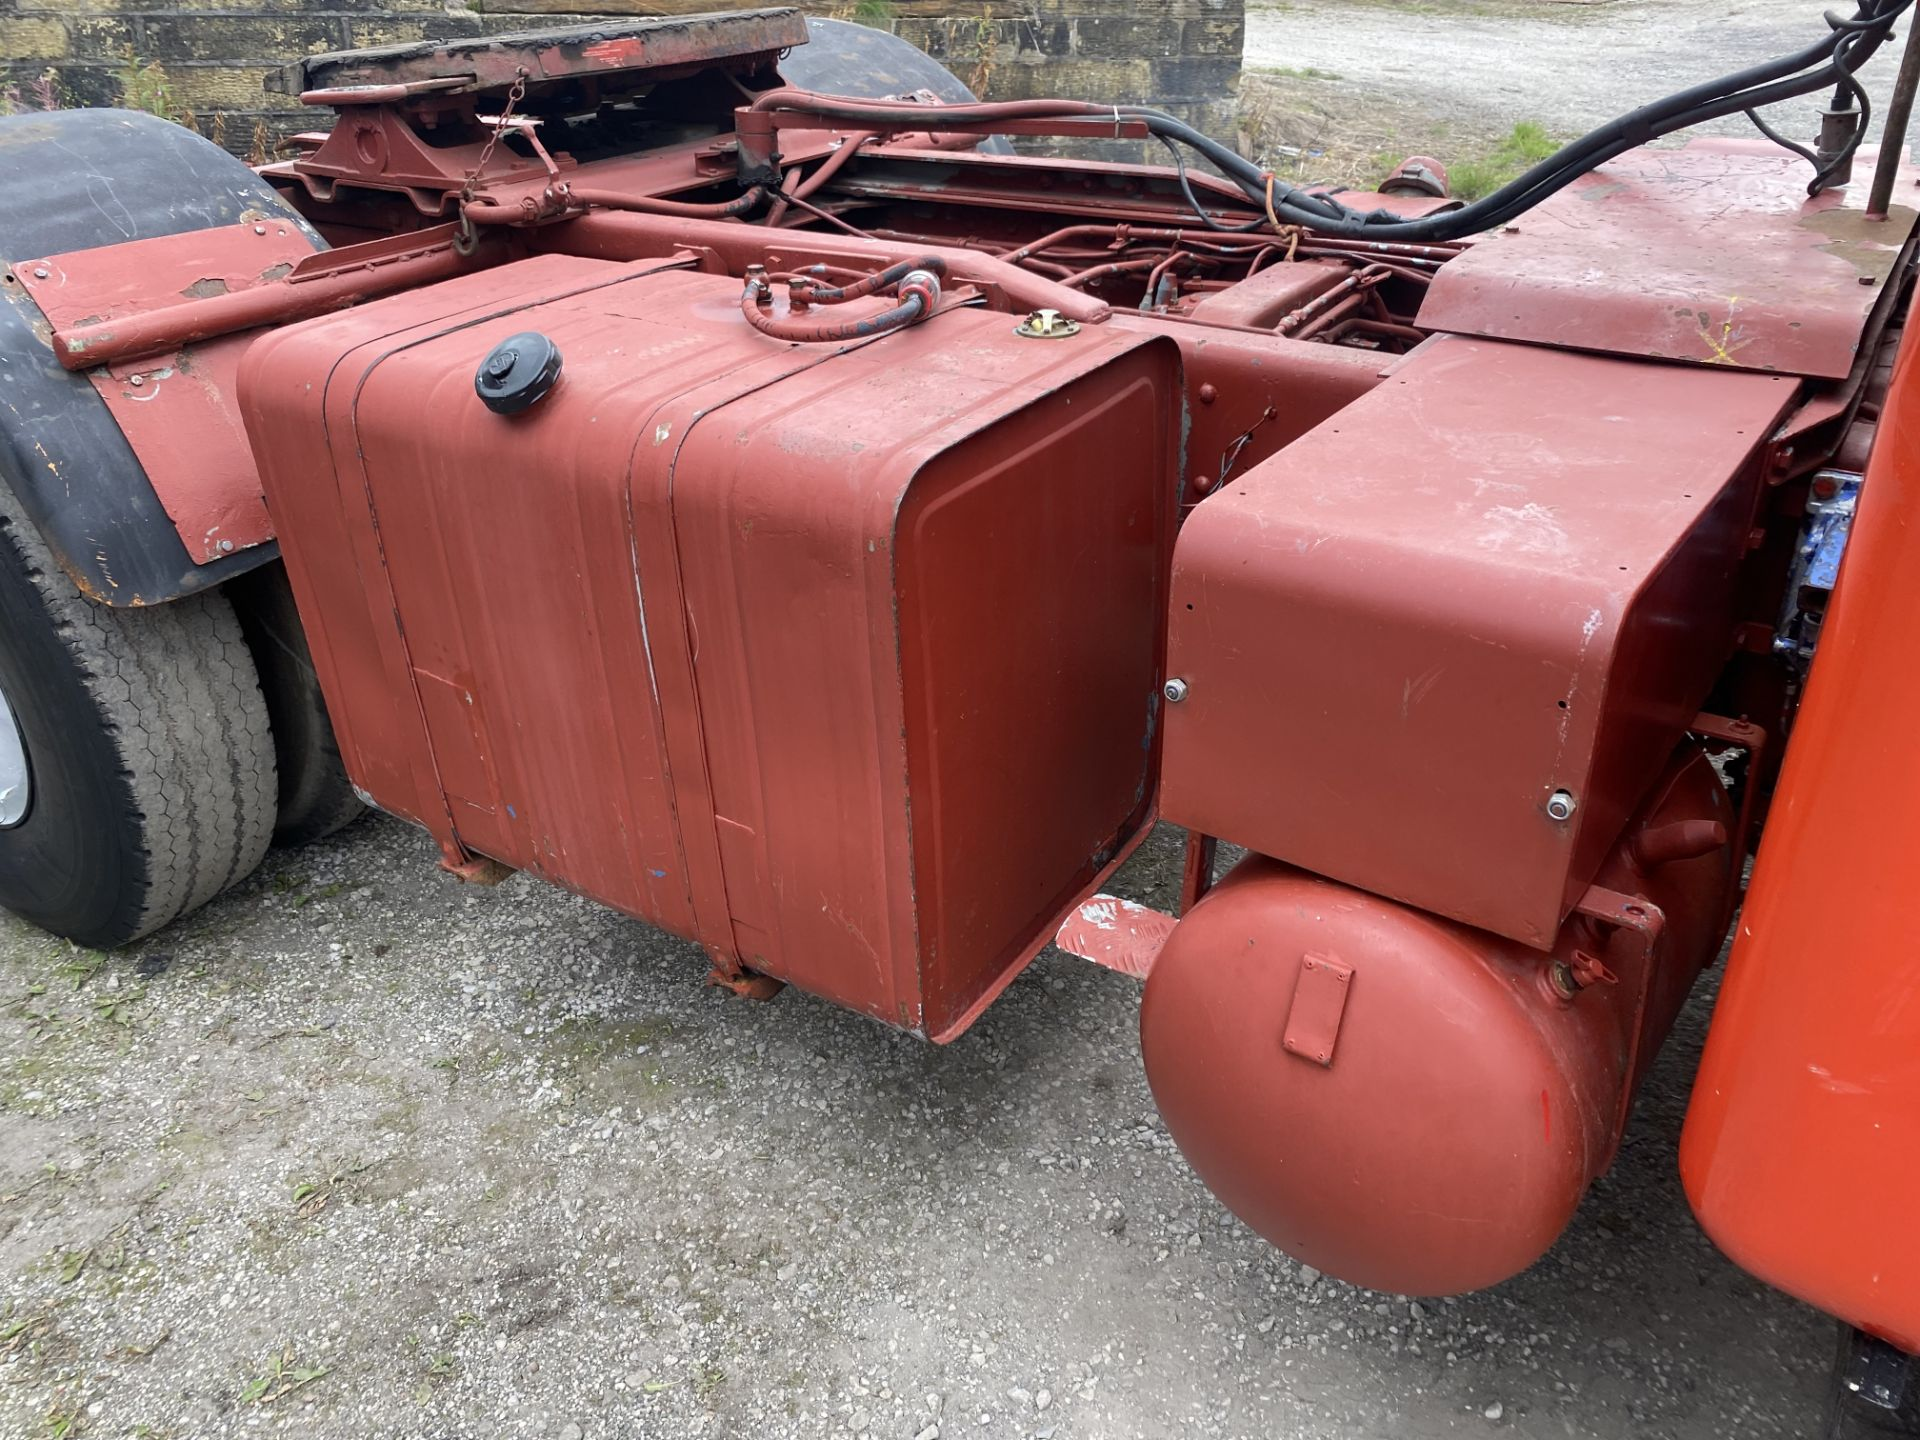 Scania 140 V8 4X2 TRACTOR UNIT, 1976, original vehicle (ex Italy - right hand drive), NOVA - Image 13 of 20